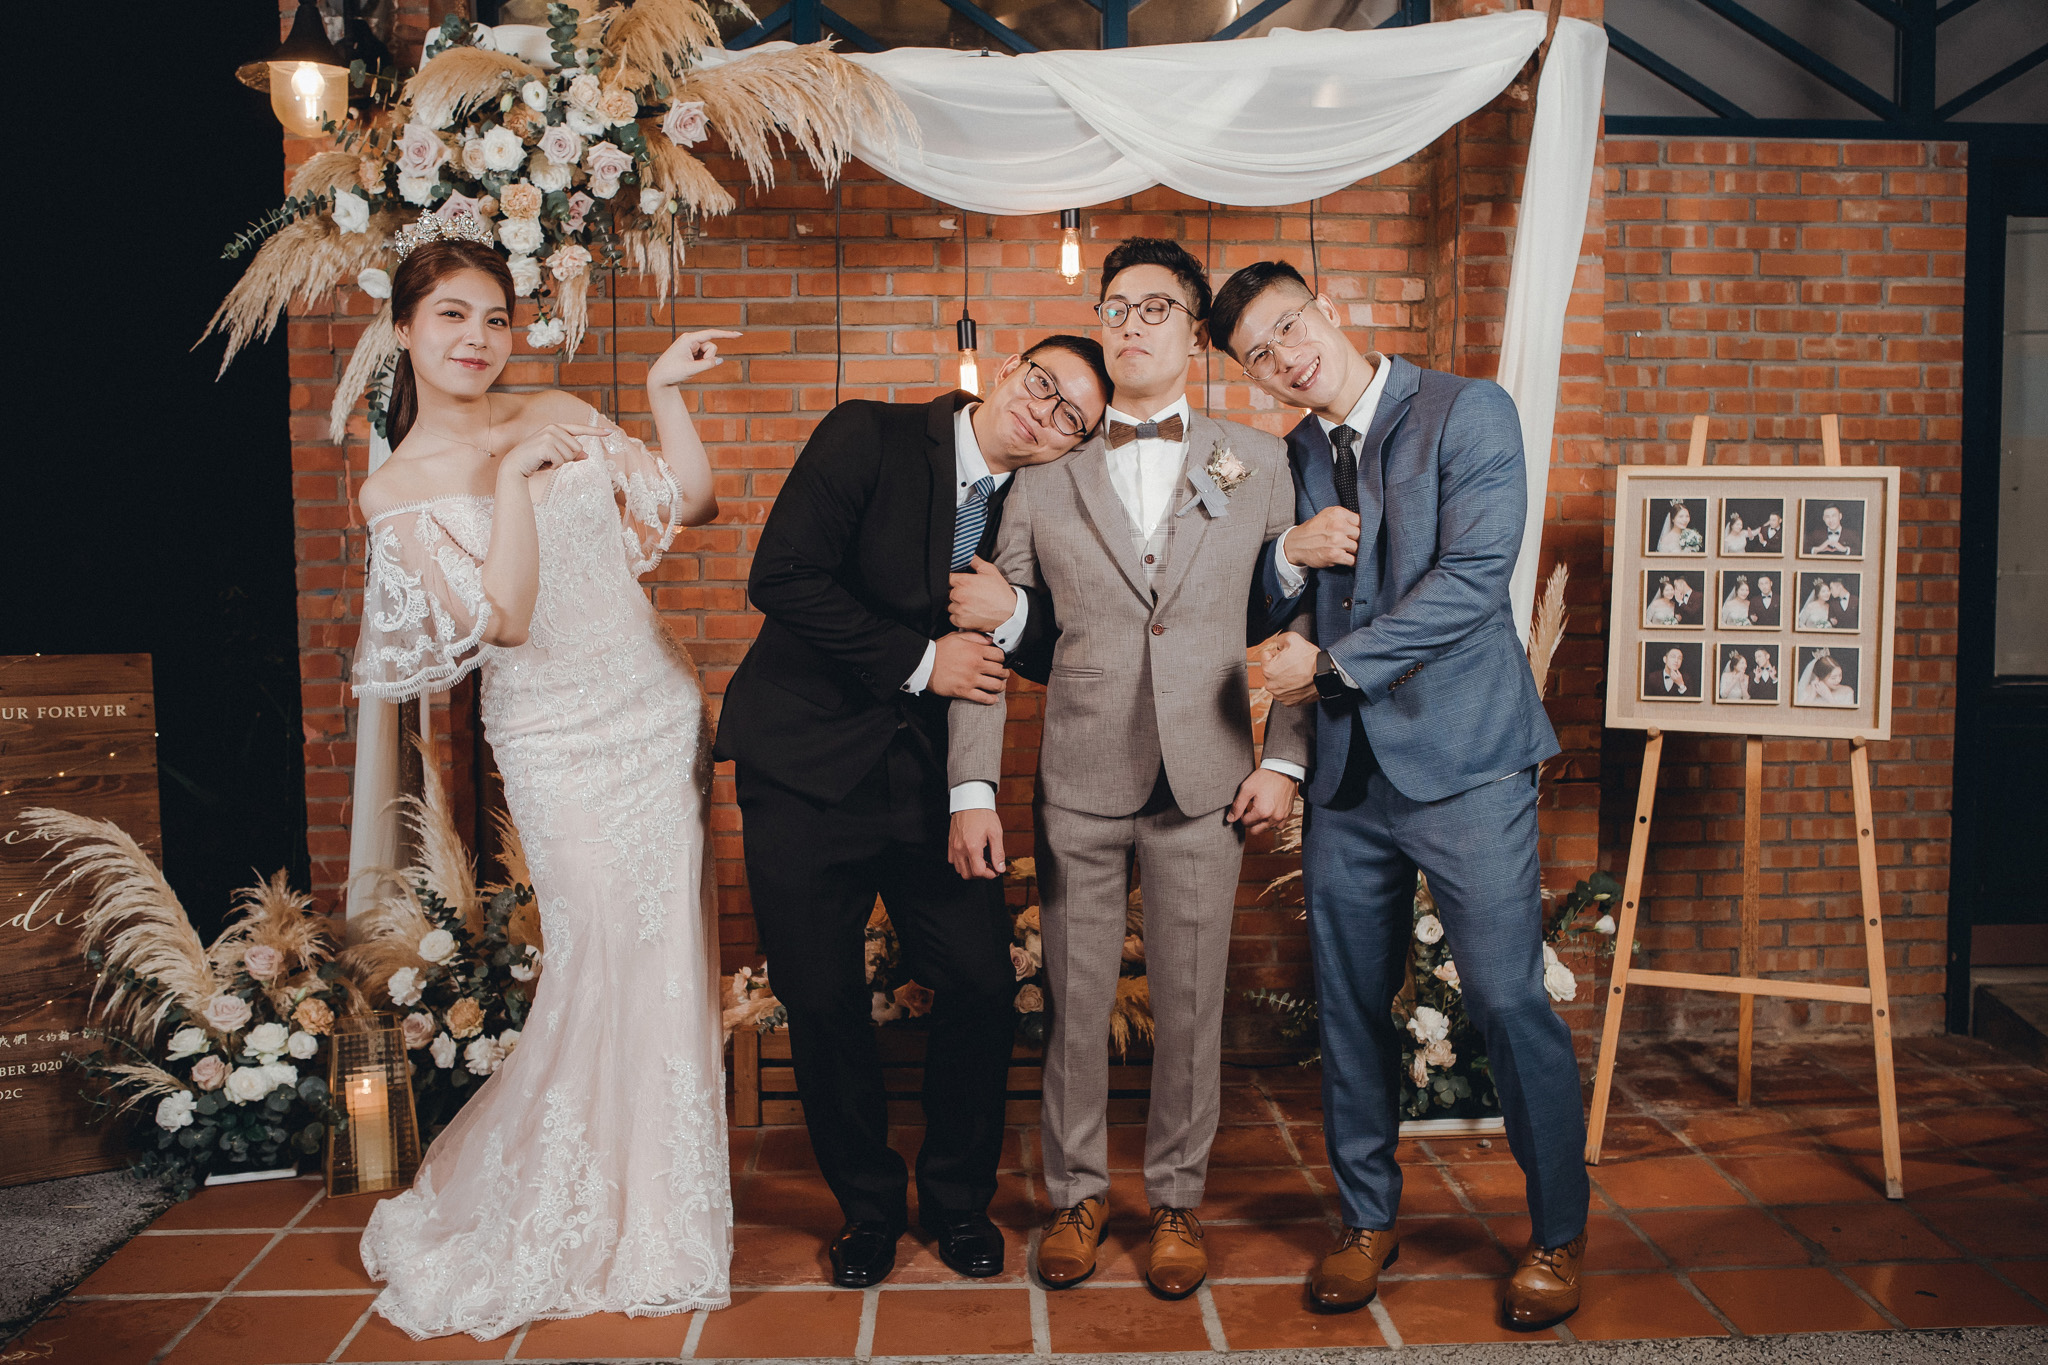 EW 台北婚攝 居米 濟南教會 Brick Yard 33 美軍俱樂部 婚禮 婚宴-112